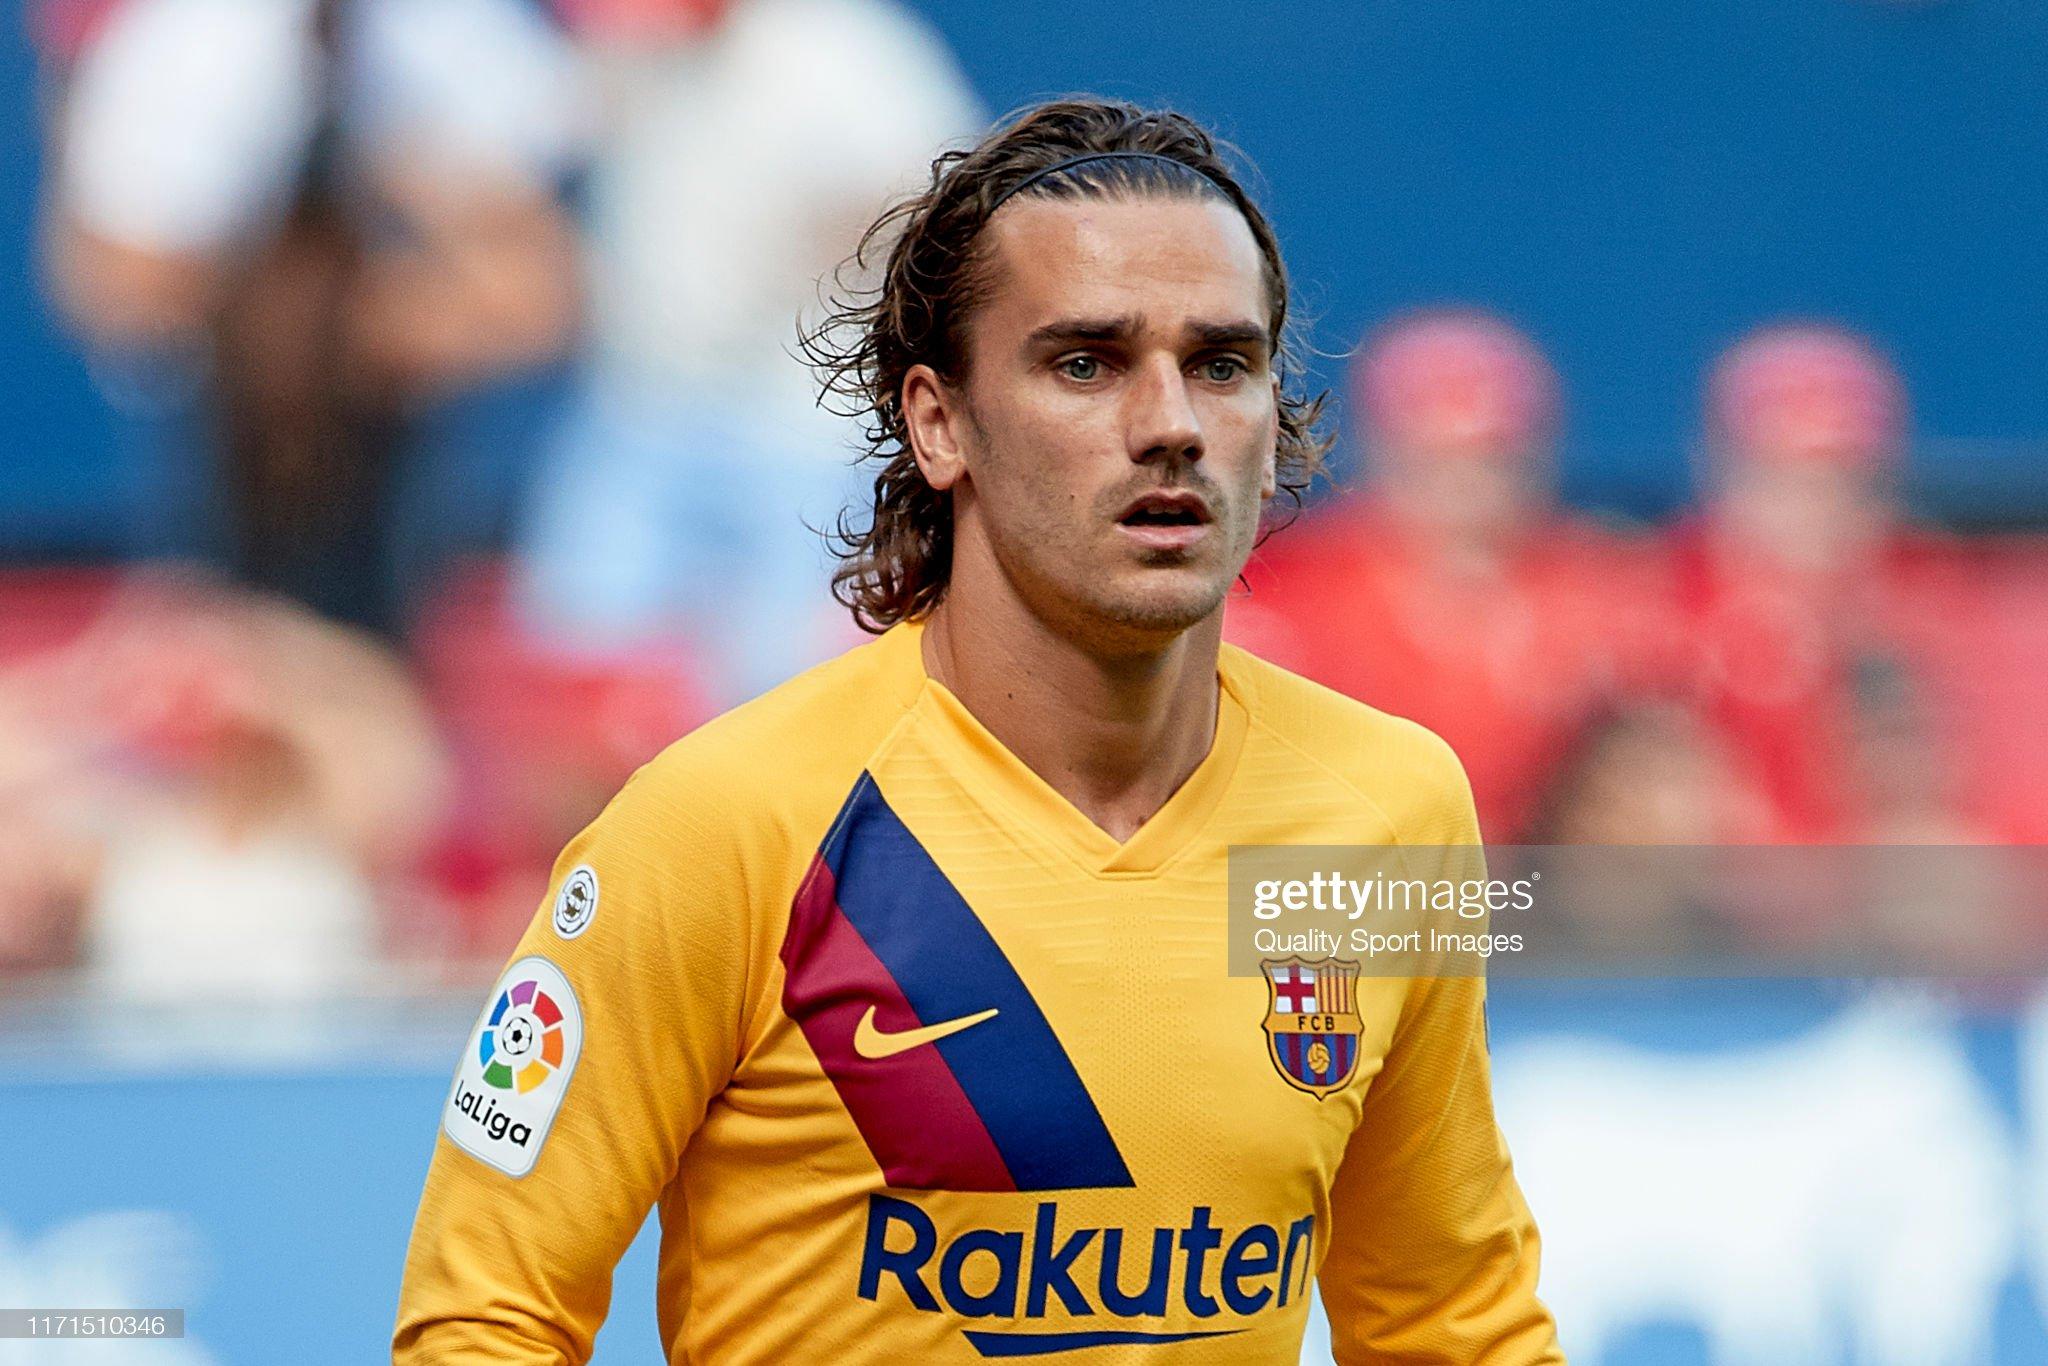 صور مباراة : أوساسونا - برشلونة 2-2 ( 31-08-2019 )  Antoine-griezmann-of-fc-barcelona-looks-on-during-the-liga-match-ca-picture-id1171510346?s=2048x2048